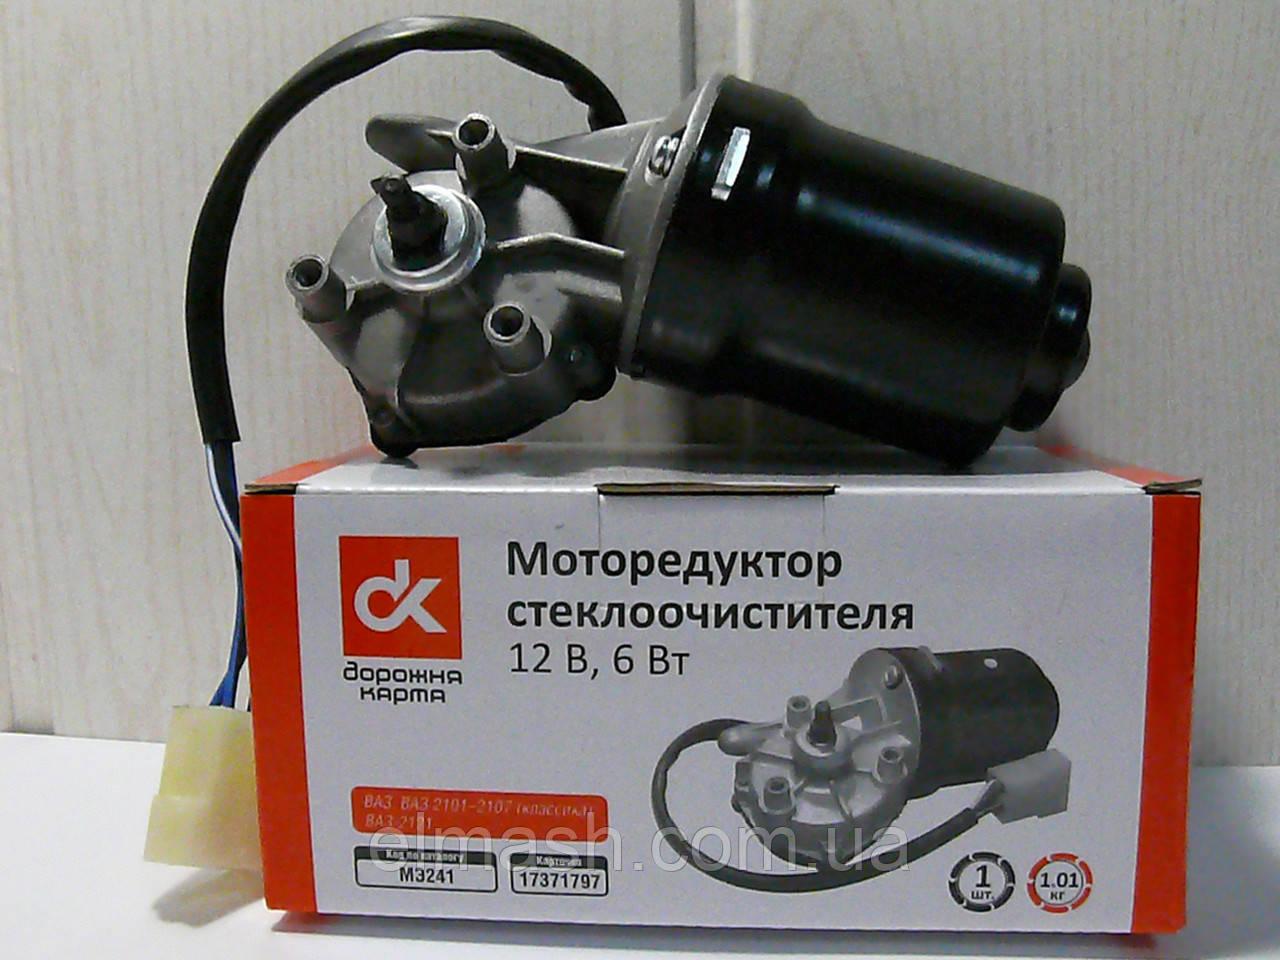 Моторедуктор стеклоочистителя ВАЗ 2101-07, 2121 12В 6Вт <ДК>